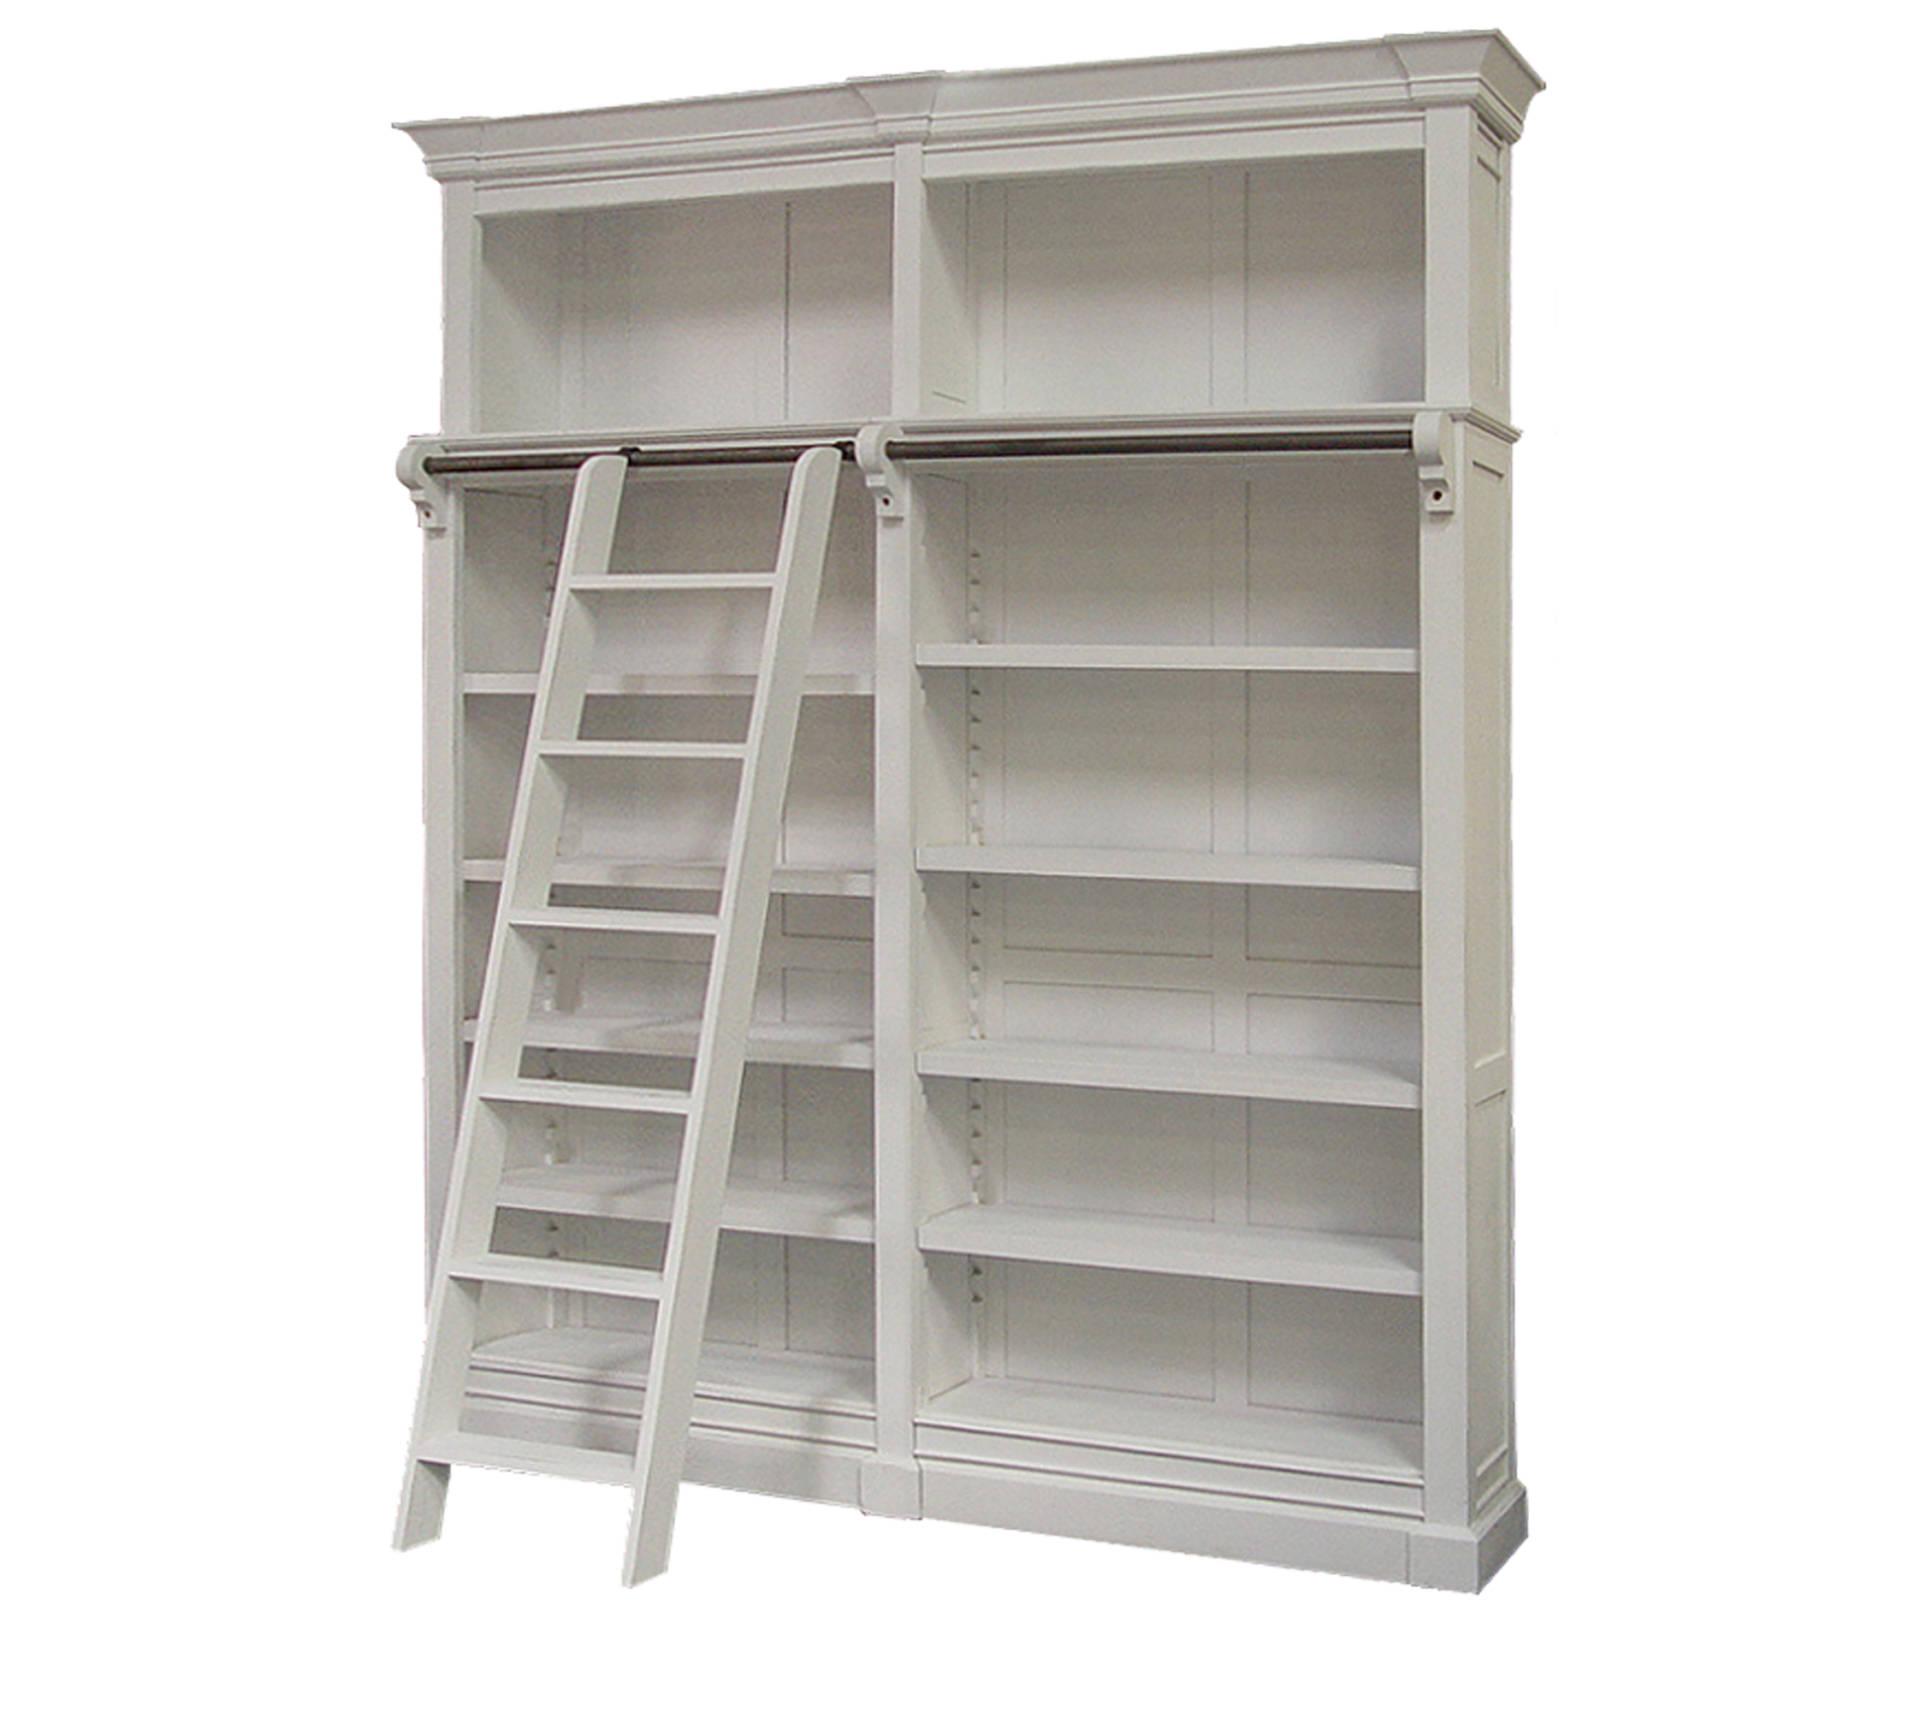 Flemington Bookcase 200 Shabby Chic White